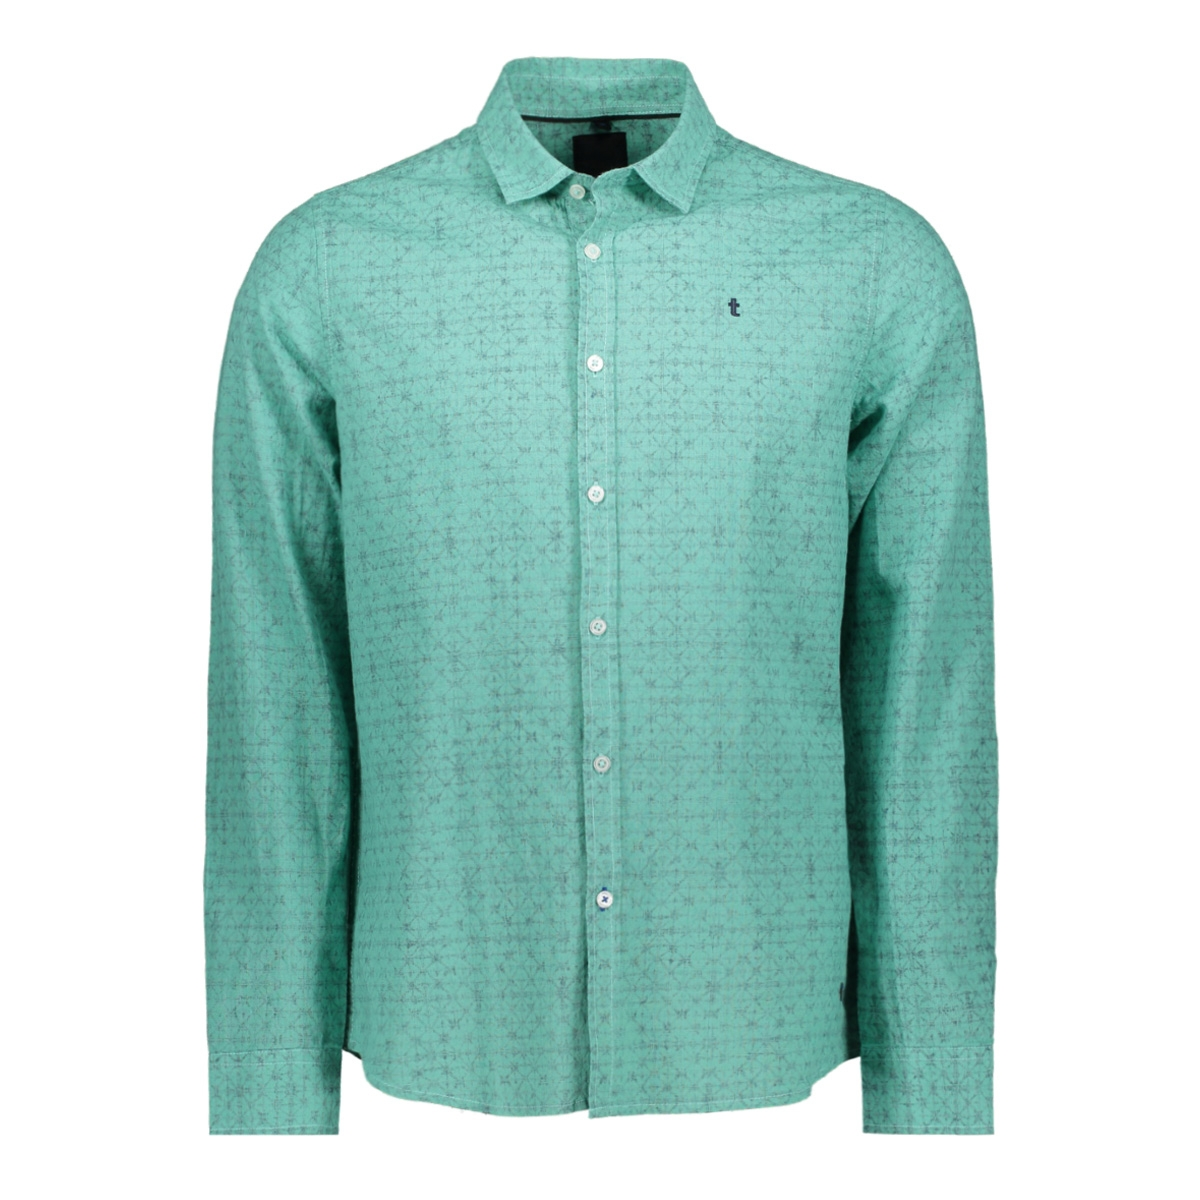 1901 2201 m 1 twinlife overhemd 5415 dusty jade